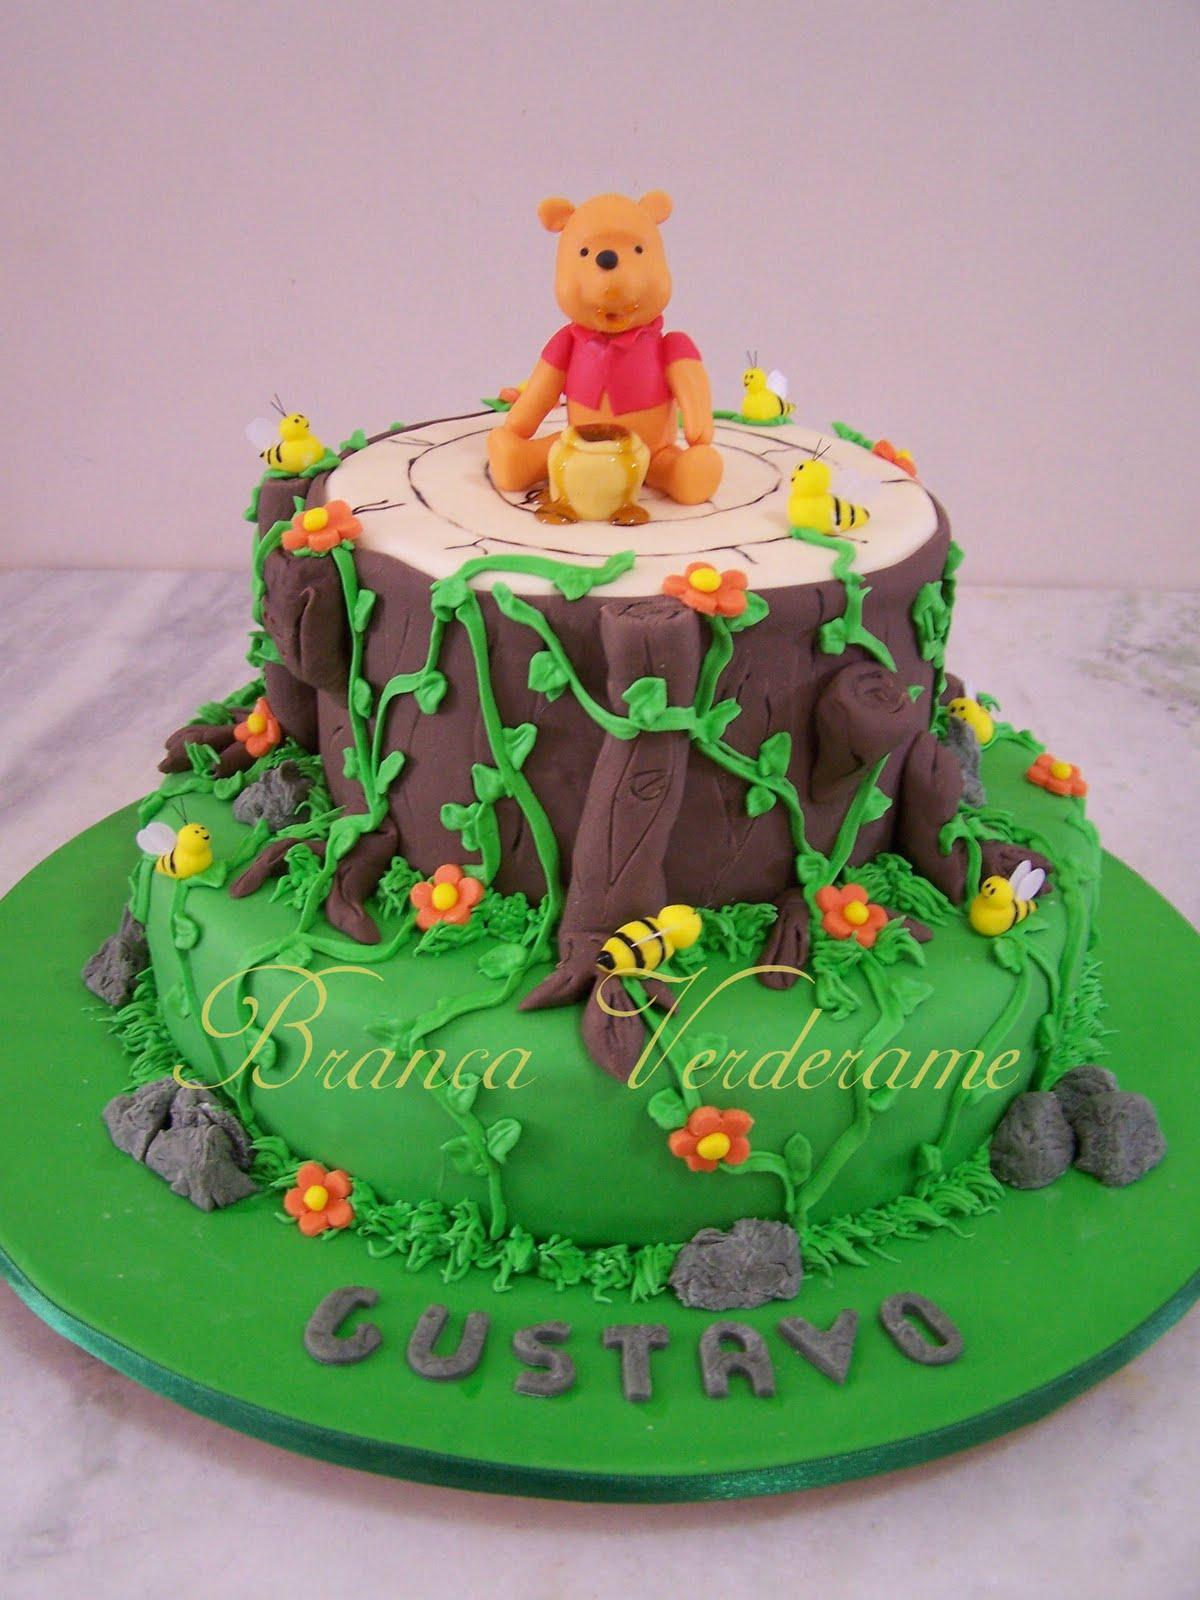 Pin Decoracao Ursinho Pooh Baby Pelautscom on Pinterest